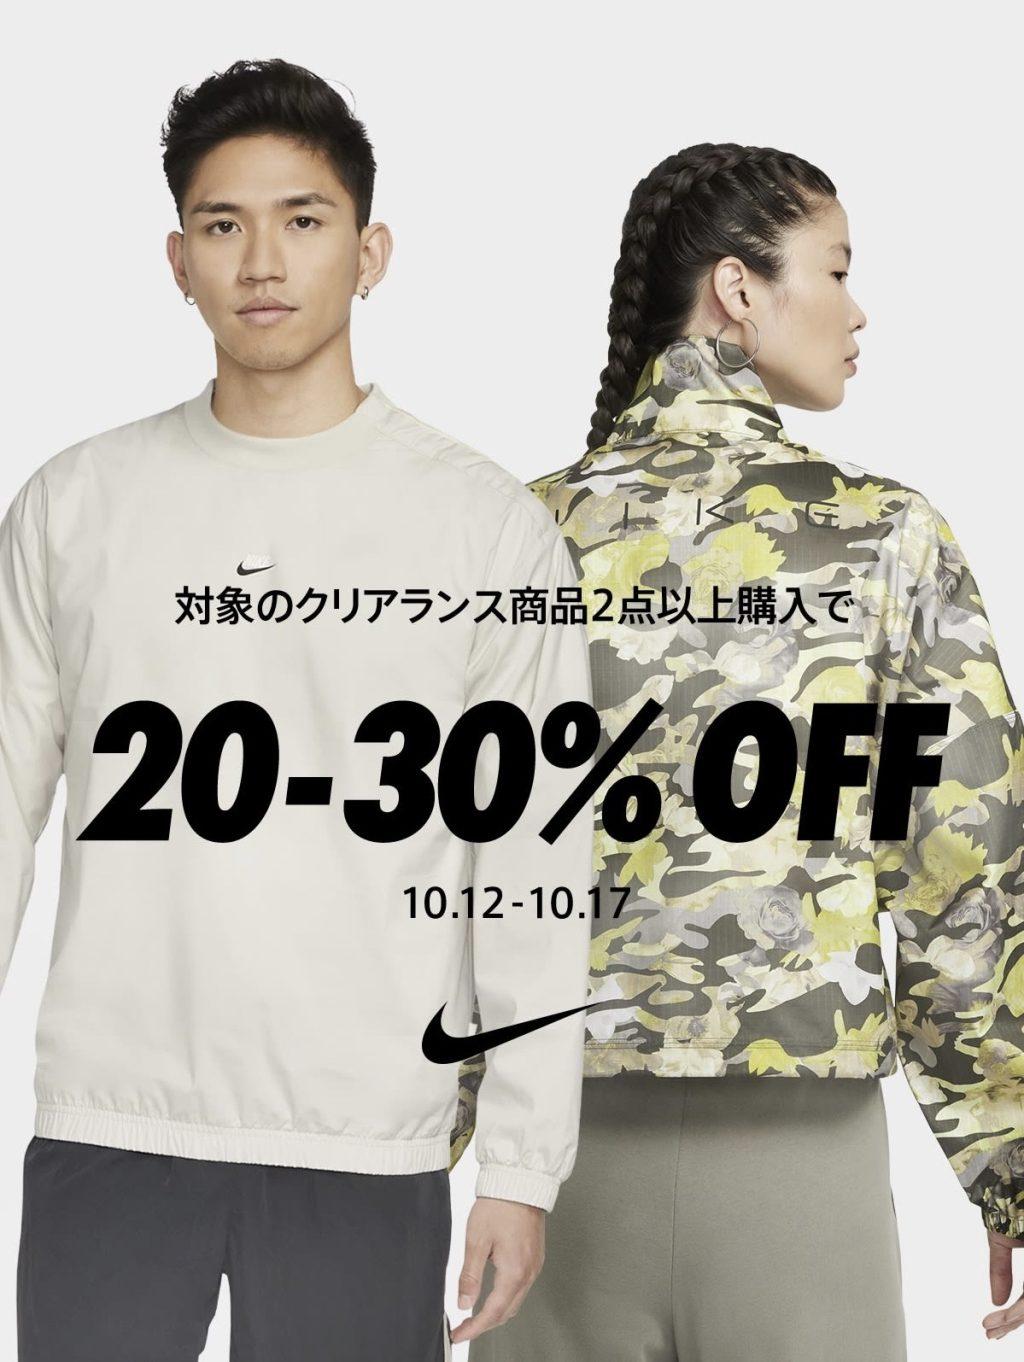 nike-online-apparel-20-30-percent-off-sale-start-20211012